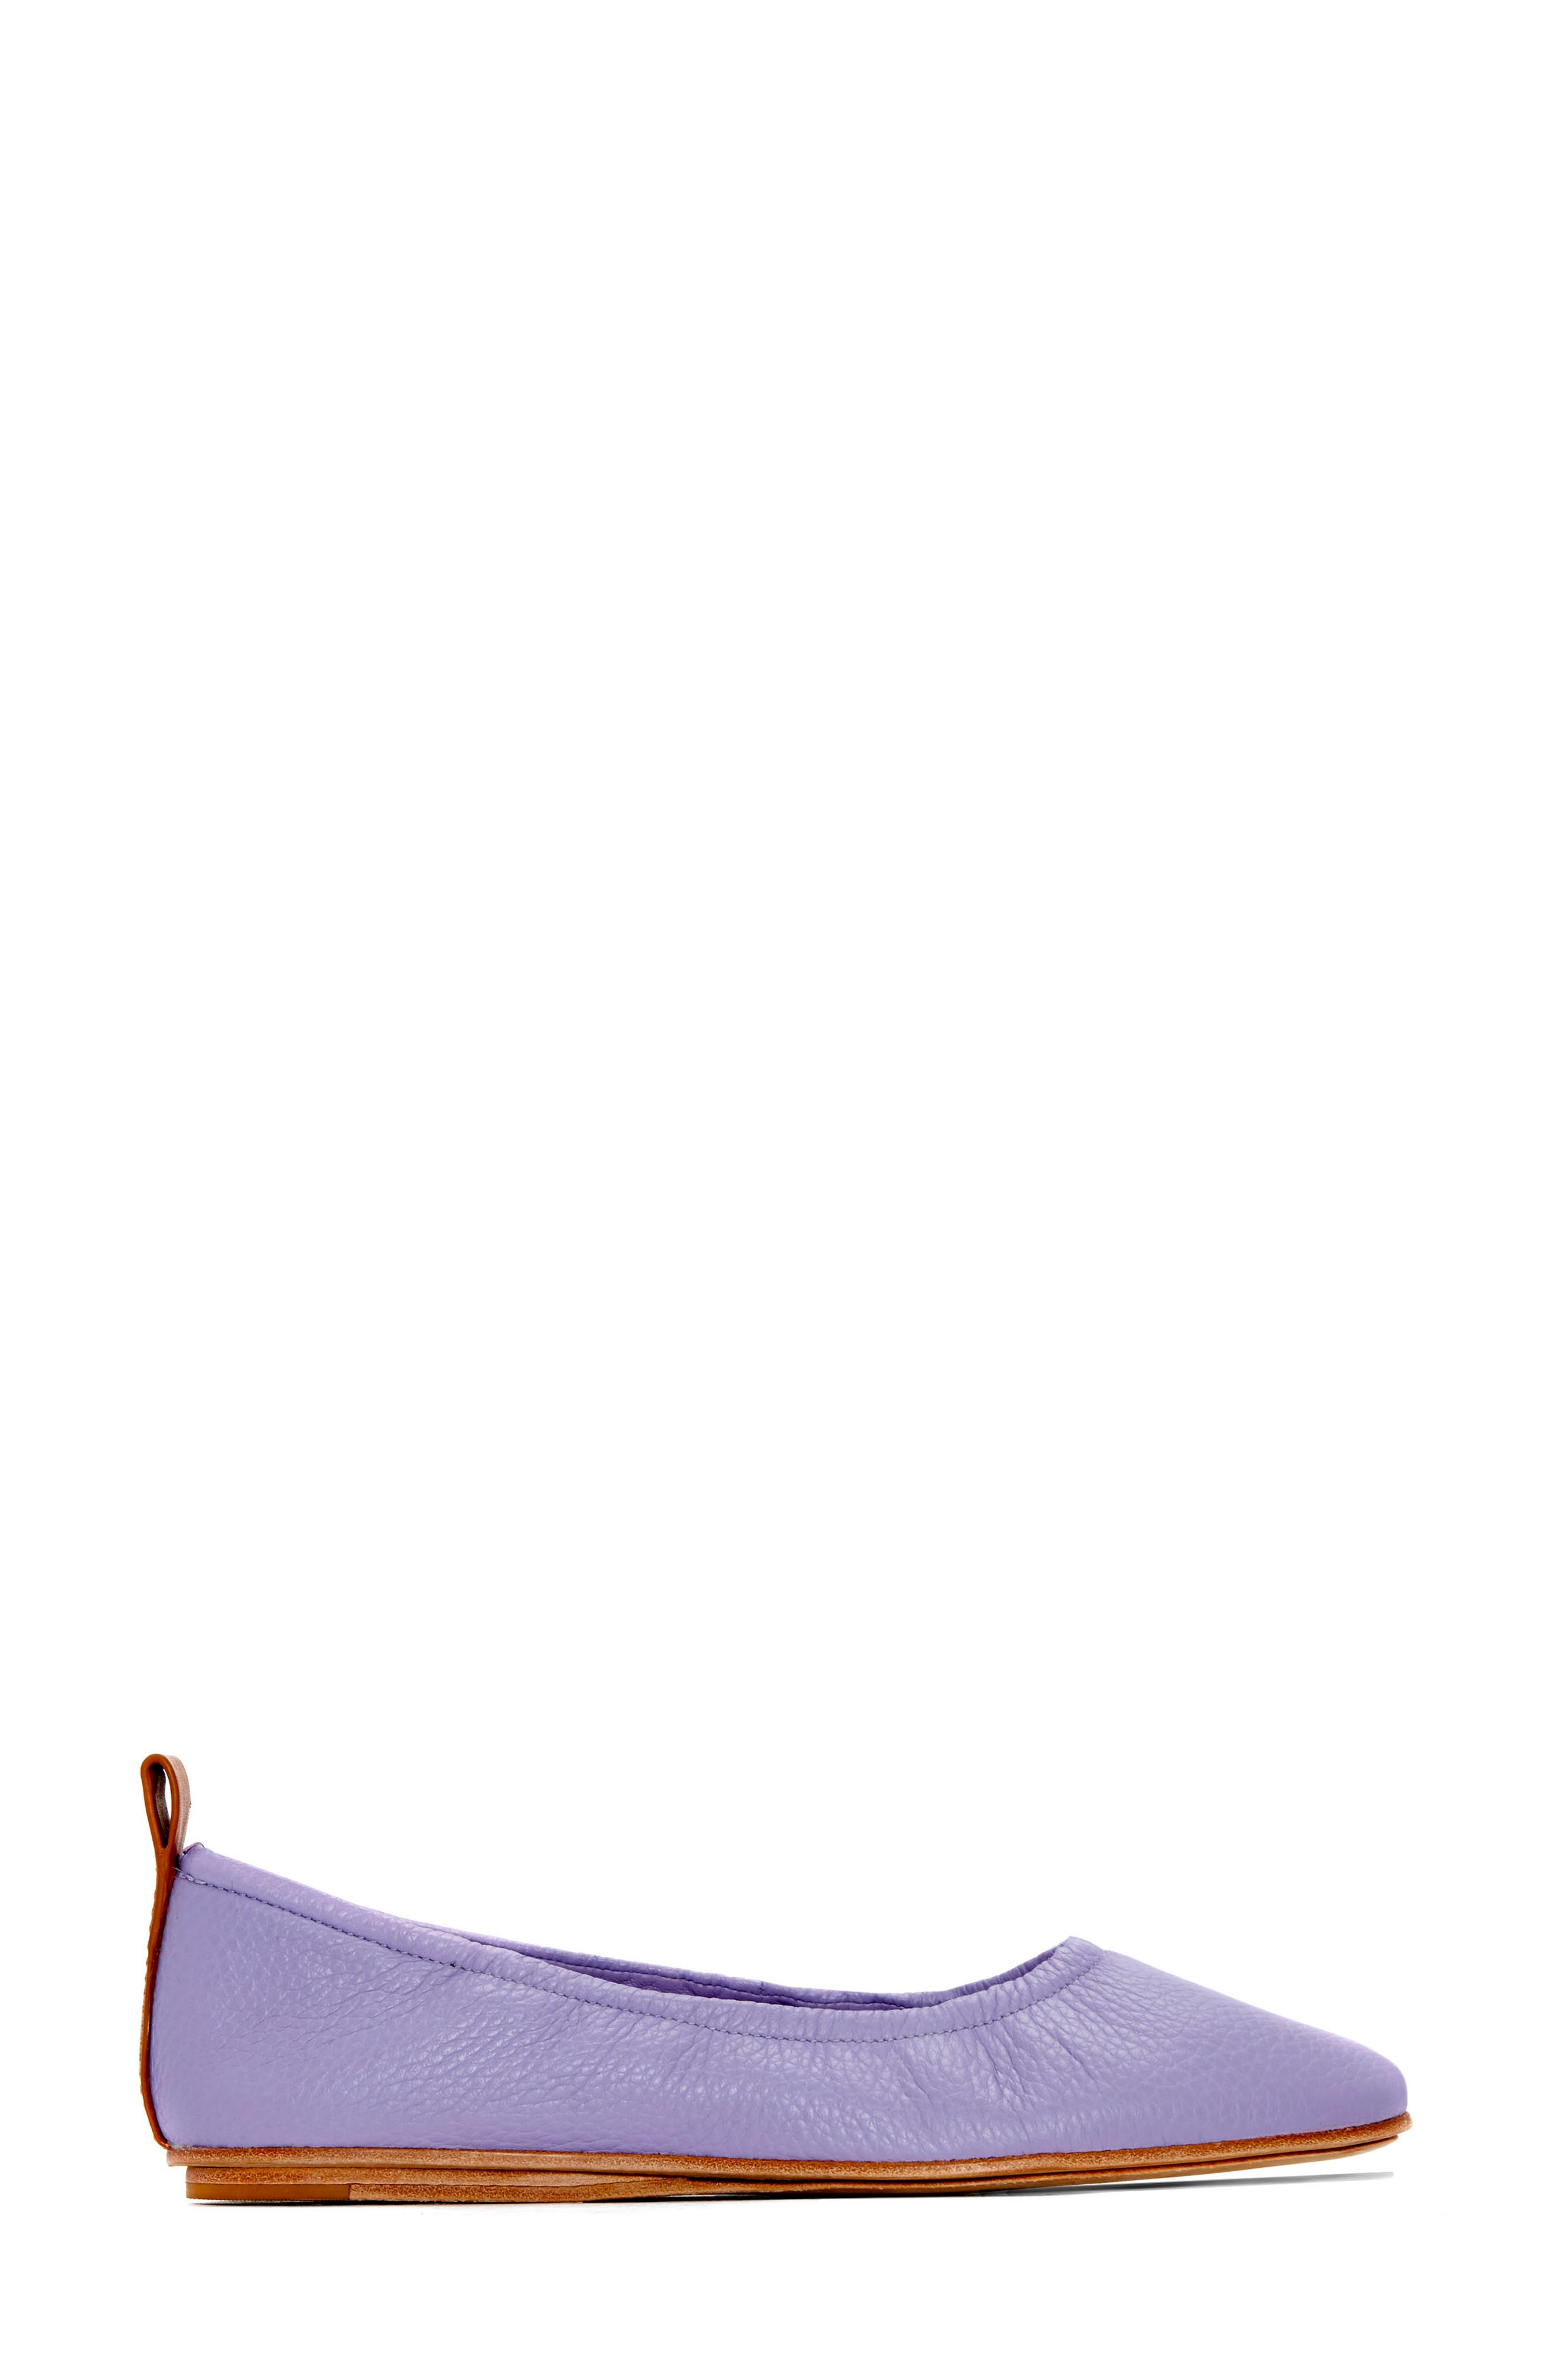 Carola Ballet Flat,                             Alternate thumbnail 2, color,                             Lavender